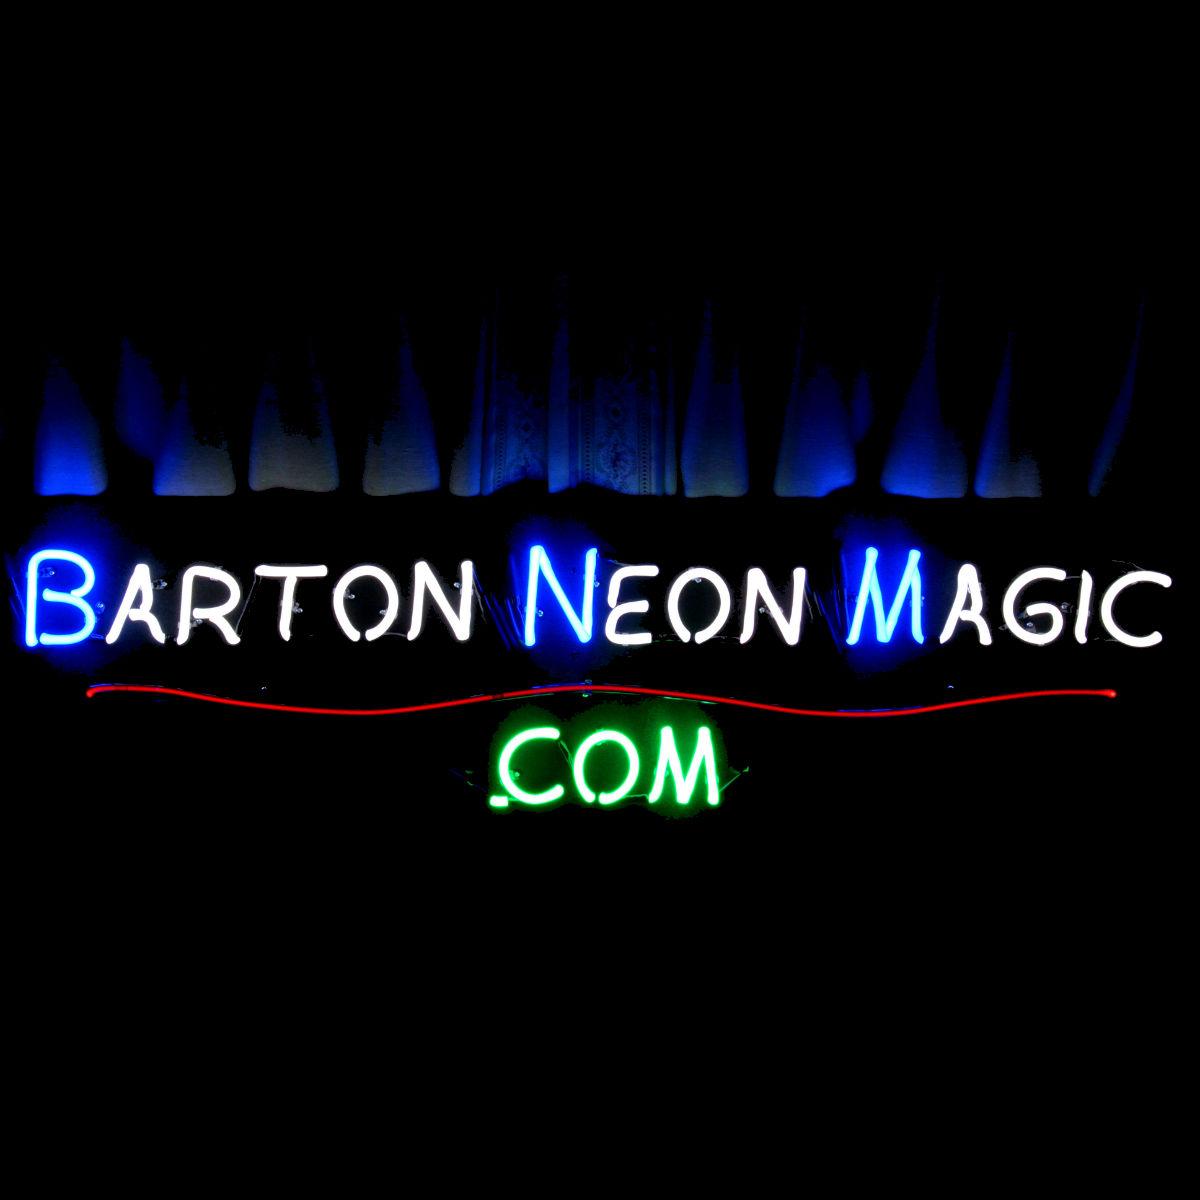 Custom Studebaker and Packard Neon Signs by John Barton - former Studebaker Packard New Car Dealer - BartonNeonMagic.com